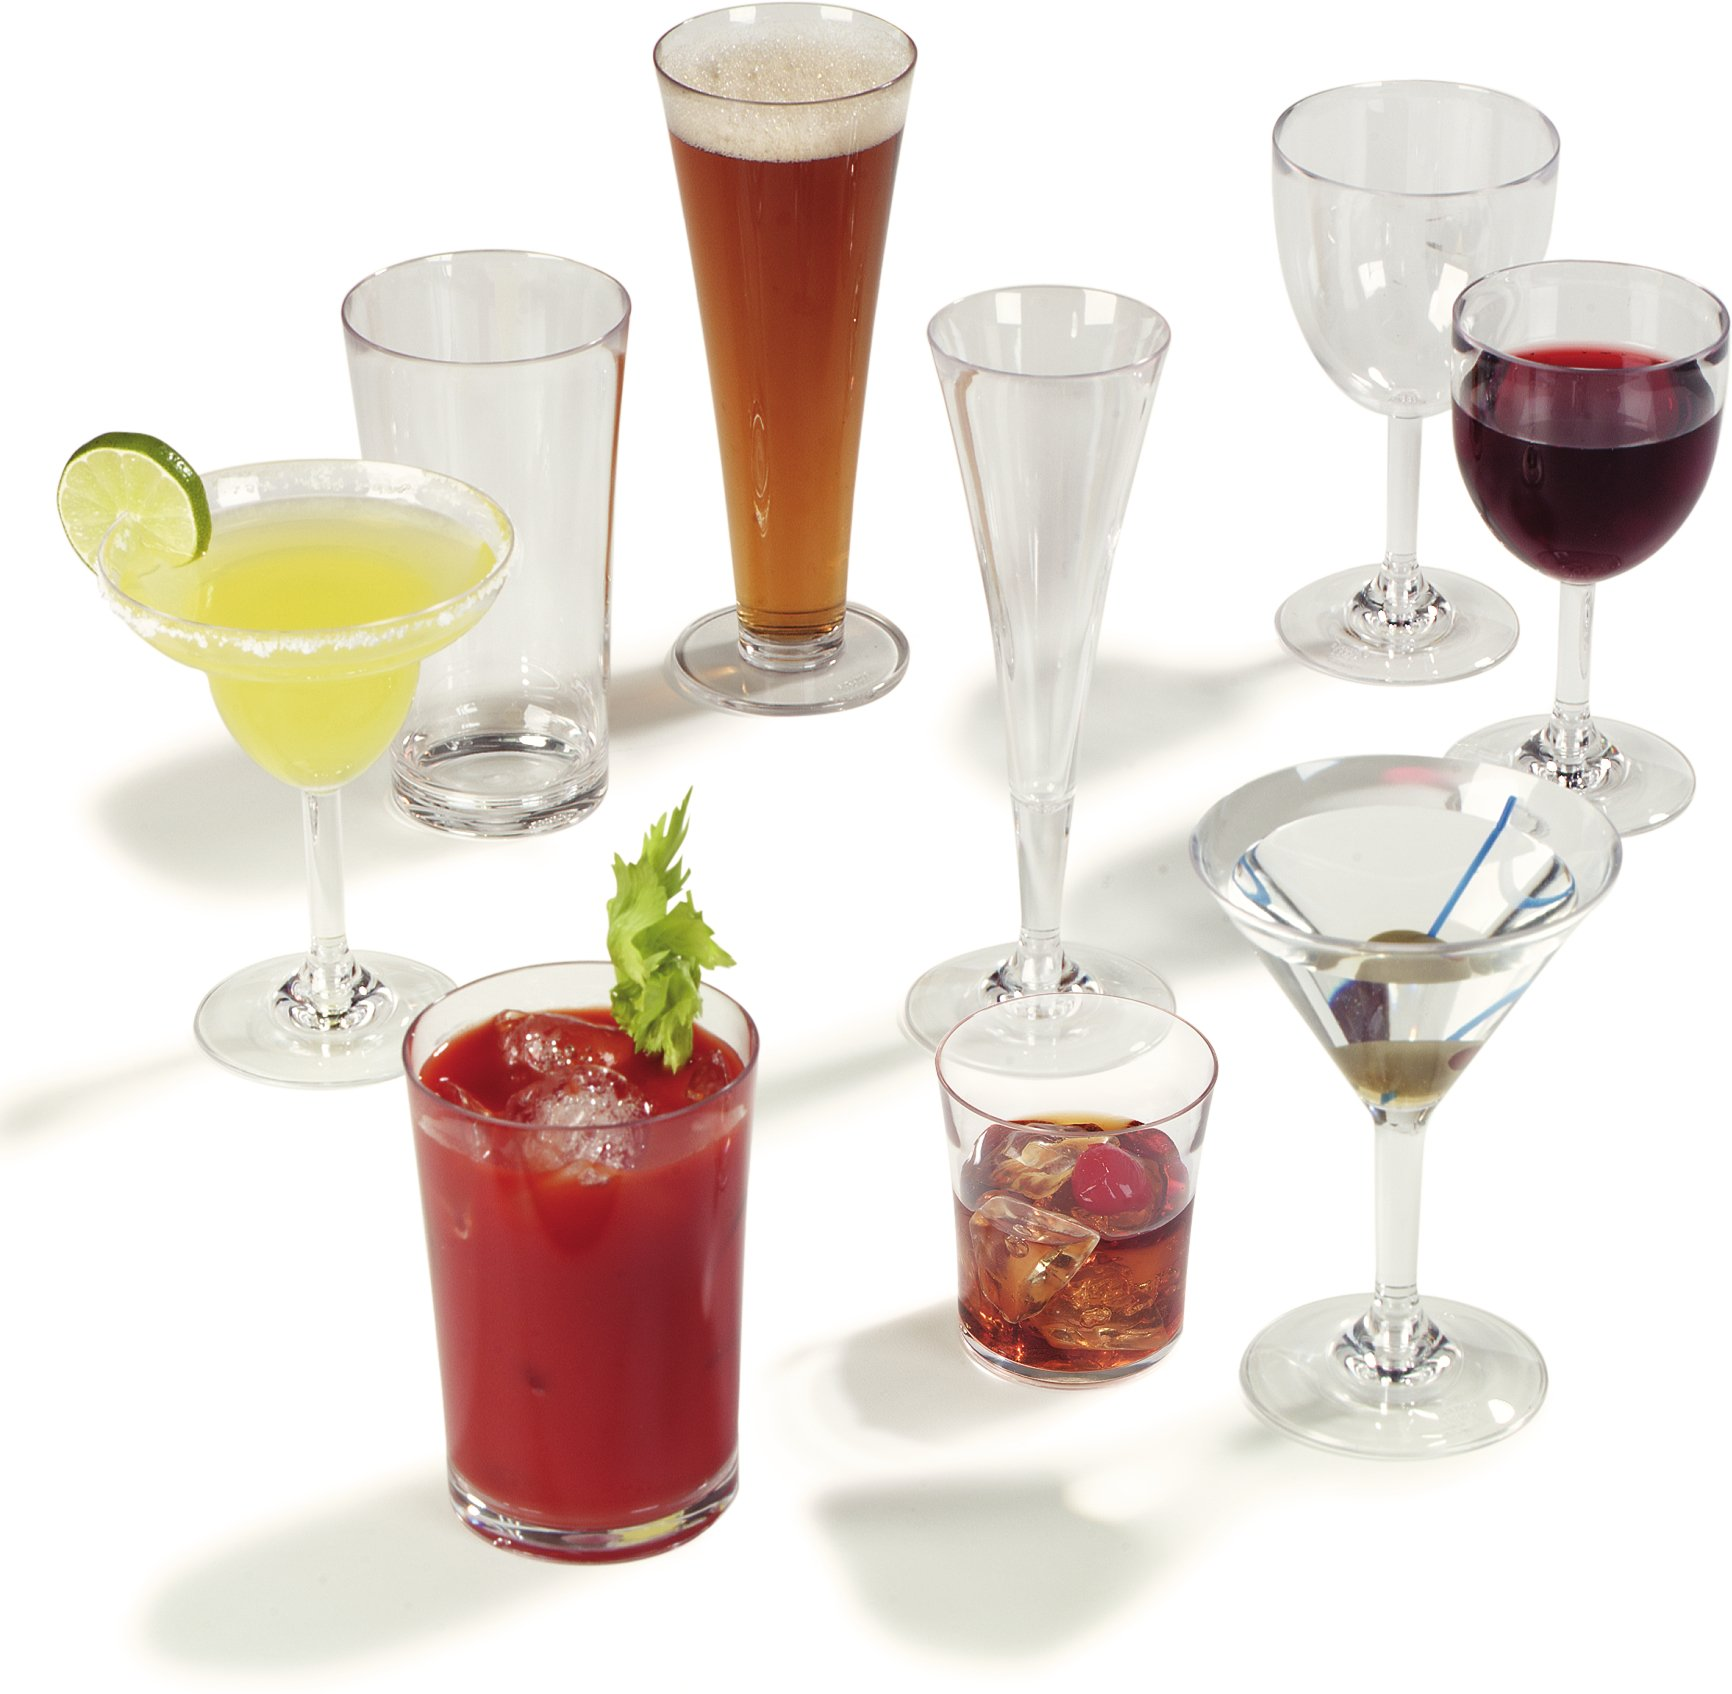 Carlisle 4362707 Liberty Polycarbonate Martini Glass, 8-oz. Capacity, Clear (Case of 24) by Carlisle (Image #9)